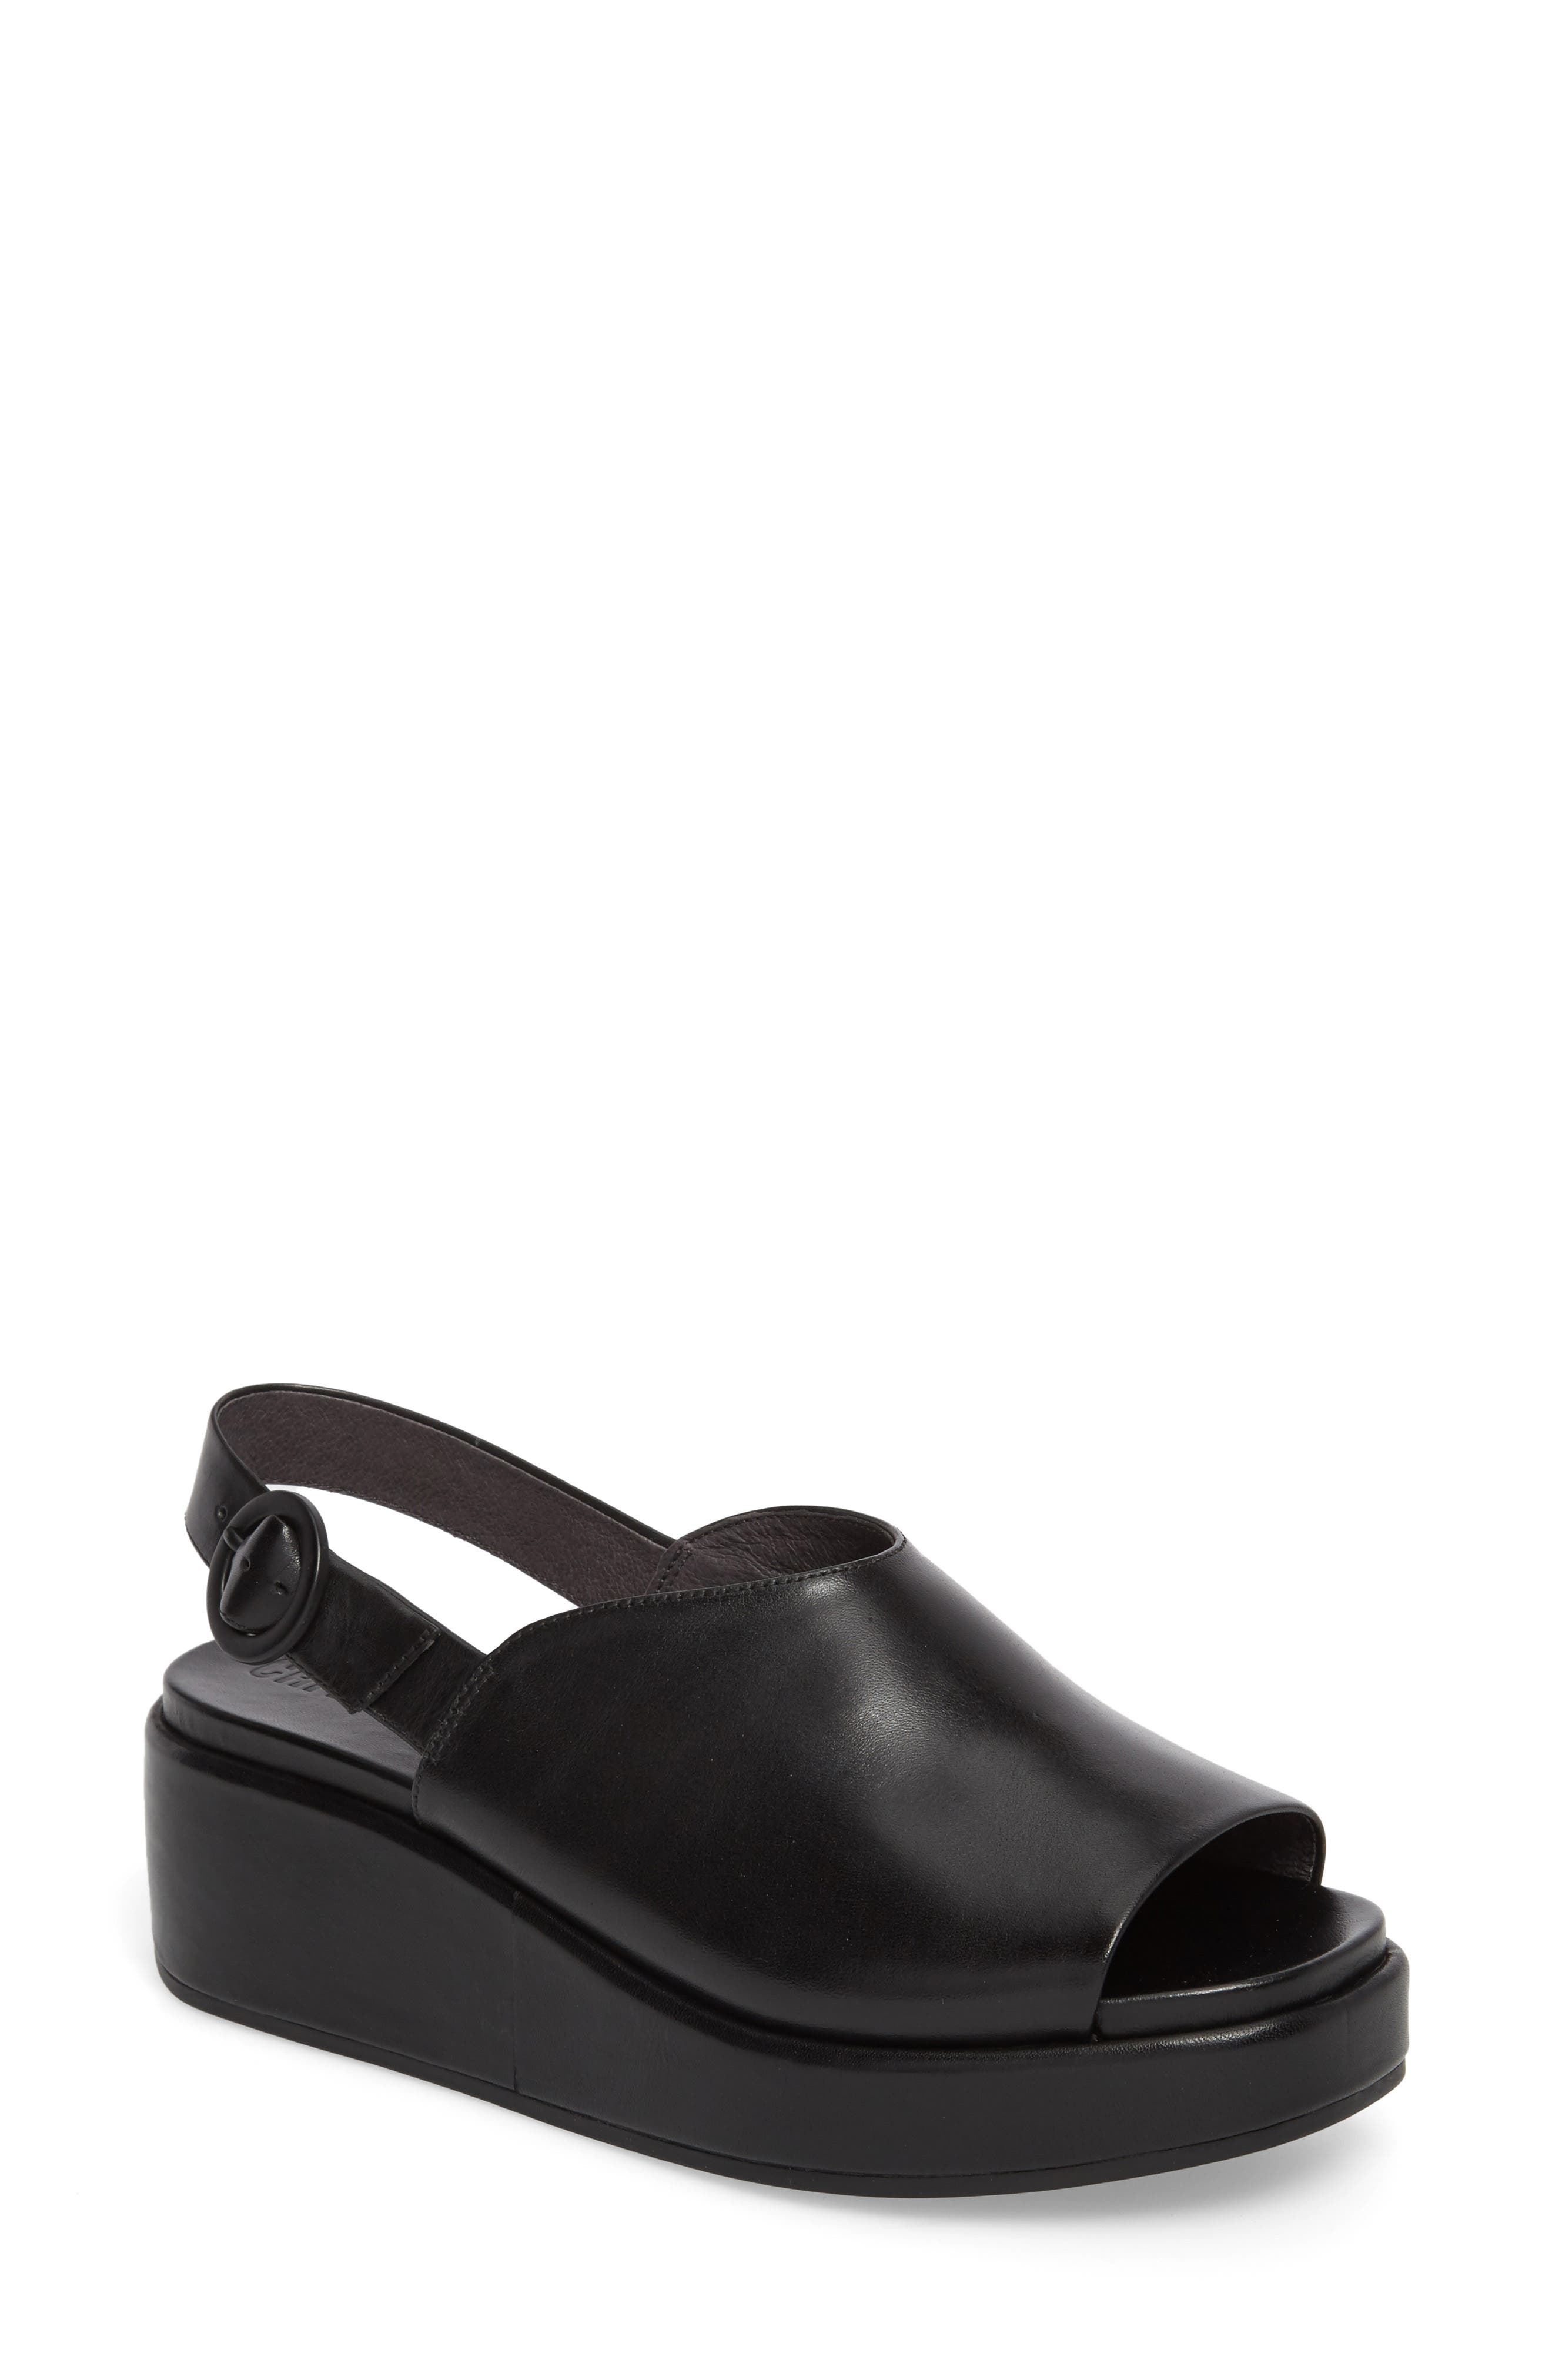 Misia Slingback Platform Wedge Sandal,                         Main,                         color, Black Leather